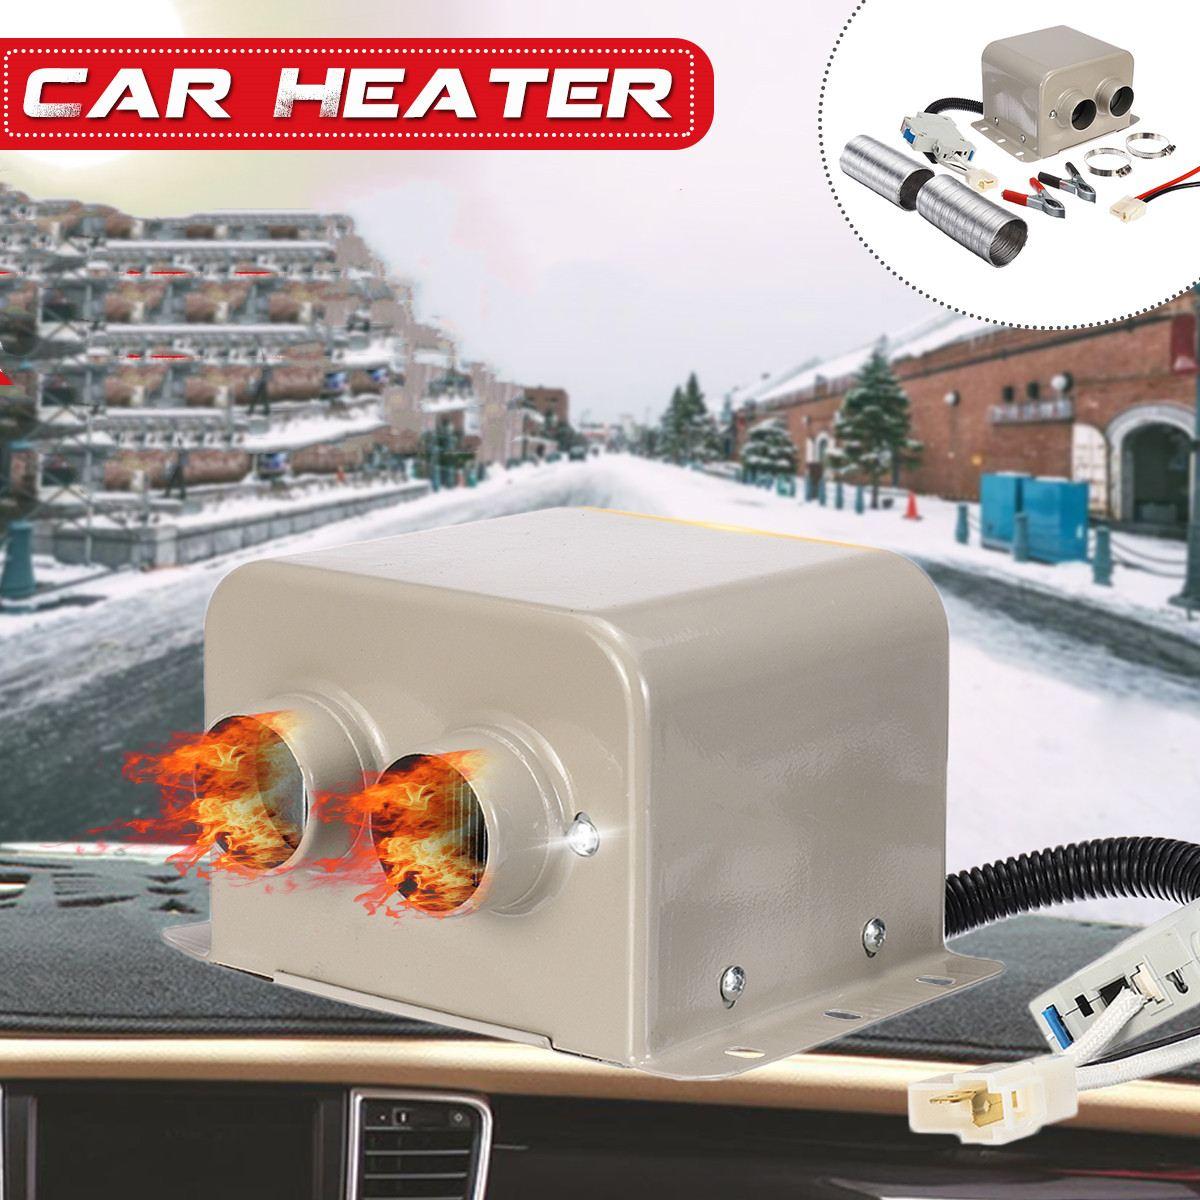 High Power 1200W/1500W Heating Fan Truck Car Auto Heater Winter Warm Dryer Glass Defroster Window Heater Interior Accessories